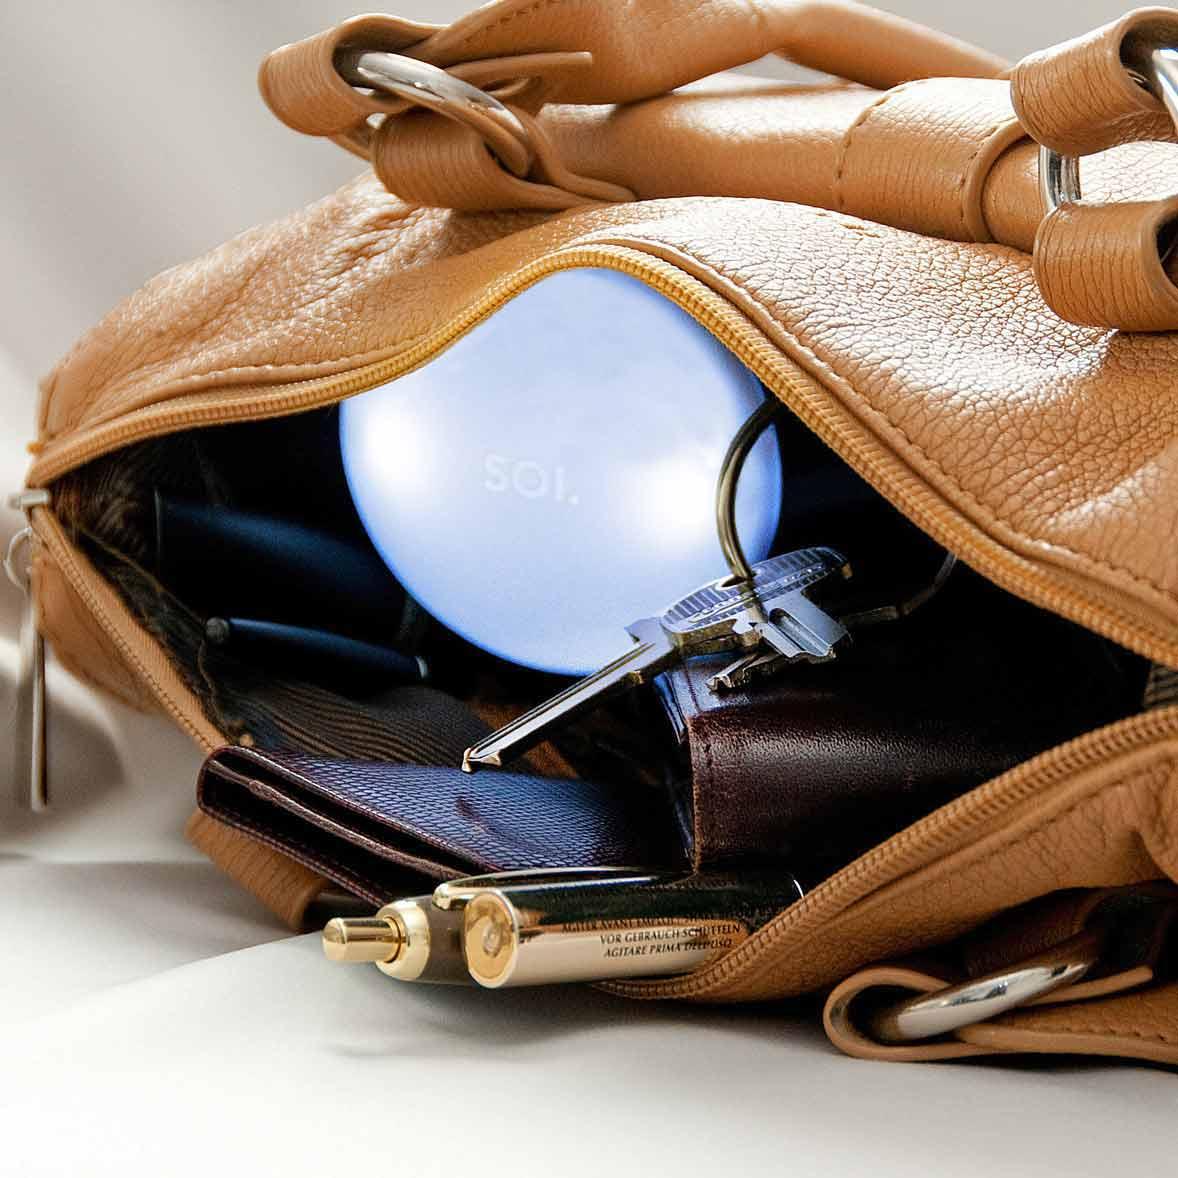 Automatic handbag light SOI   The Design Gift Shop